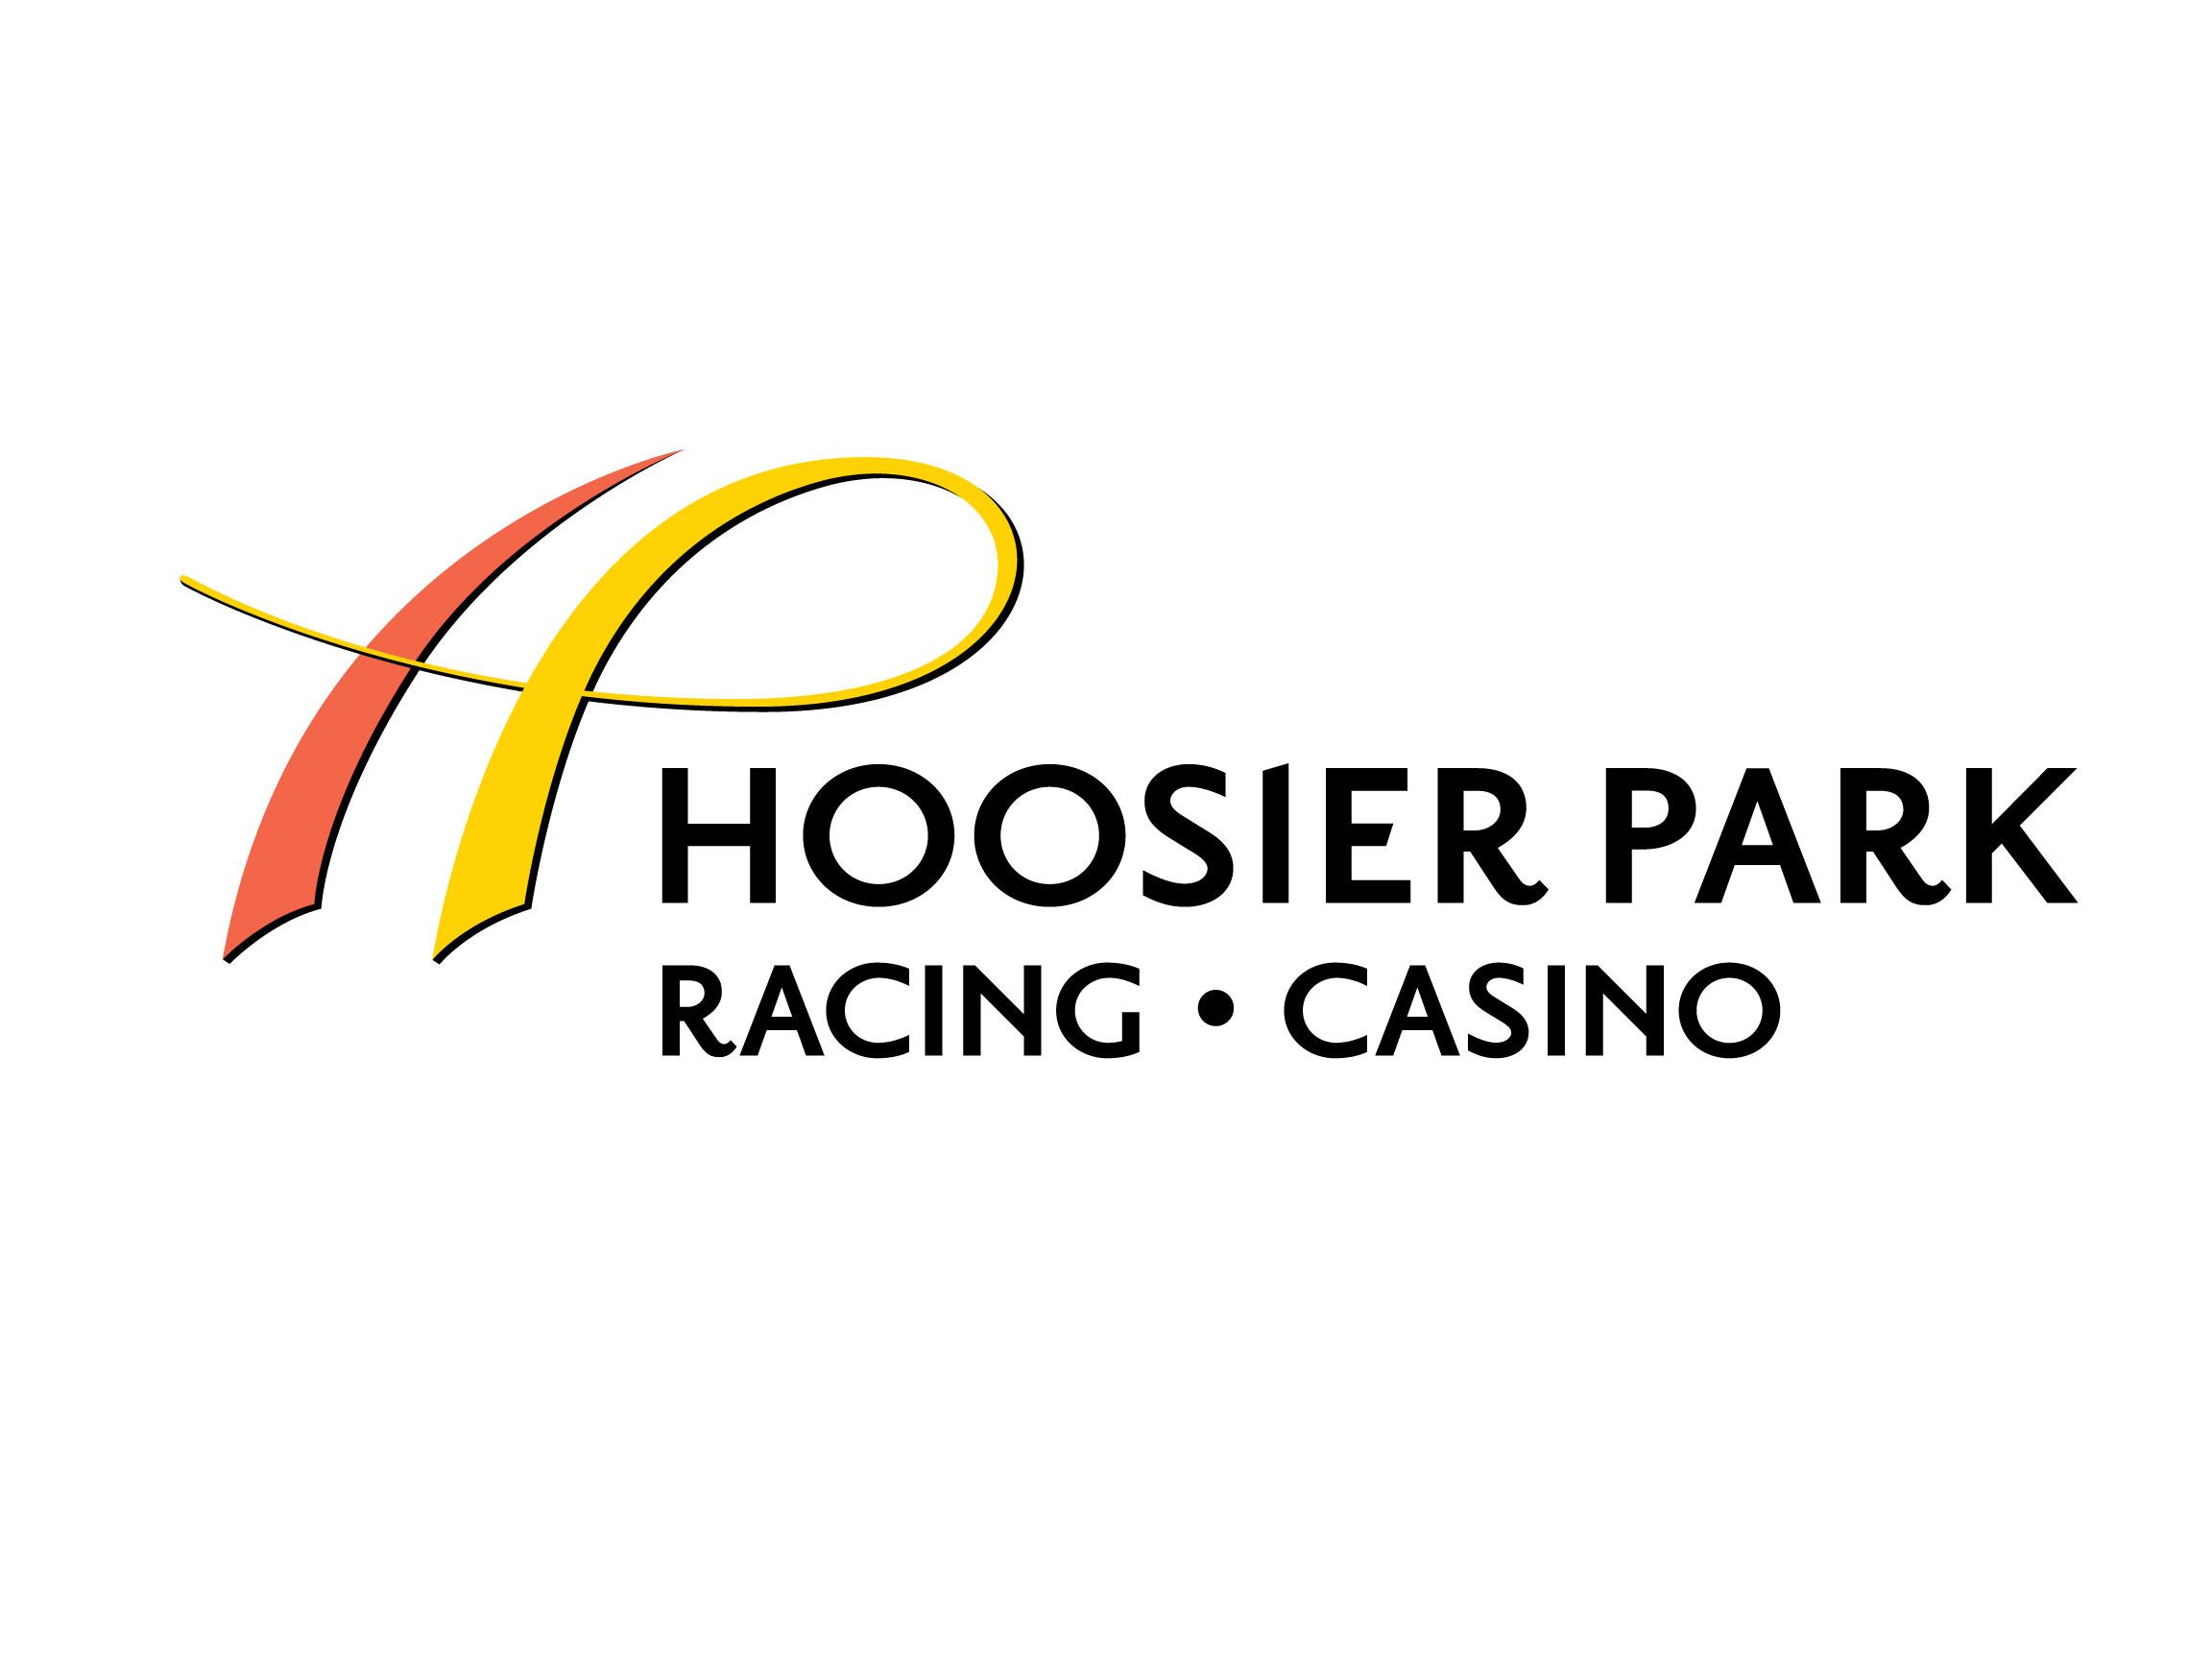 Hoosier-Park-Racing-Casino-Logo.jpeg